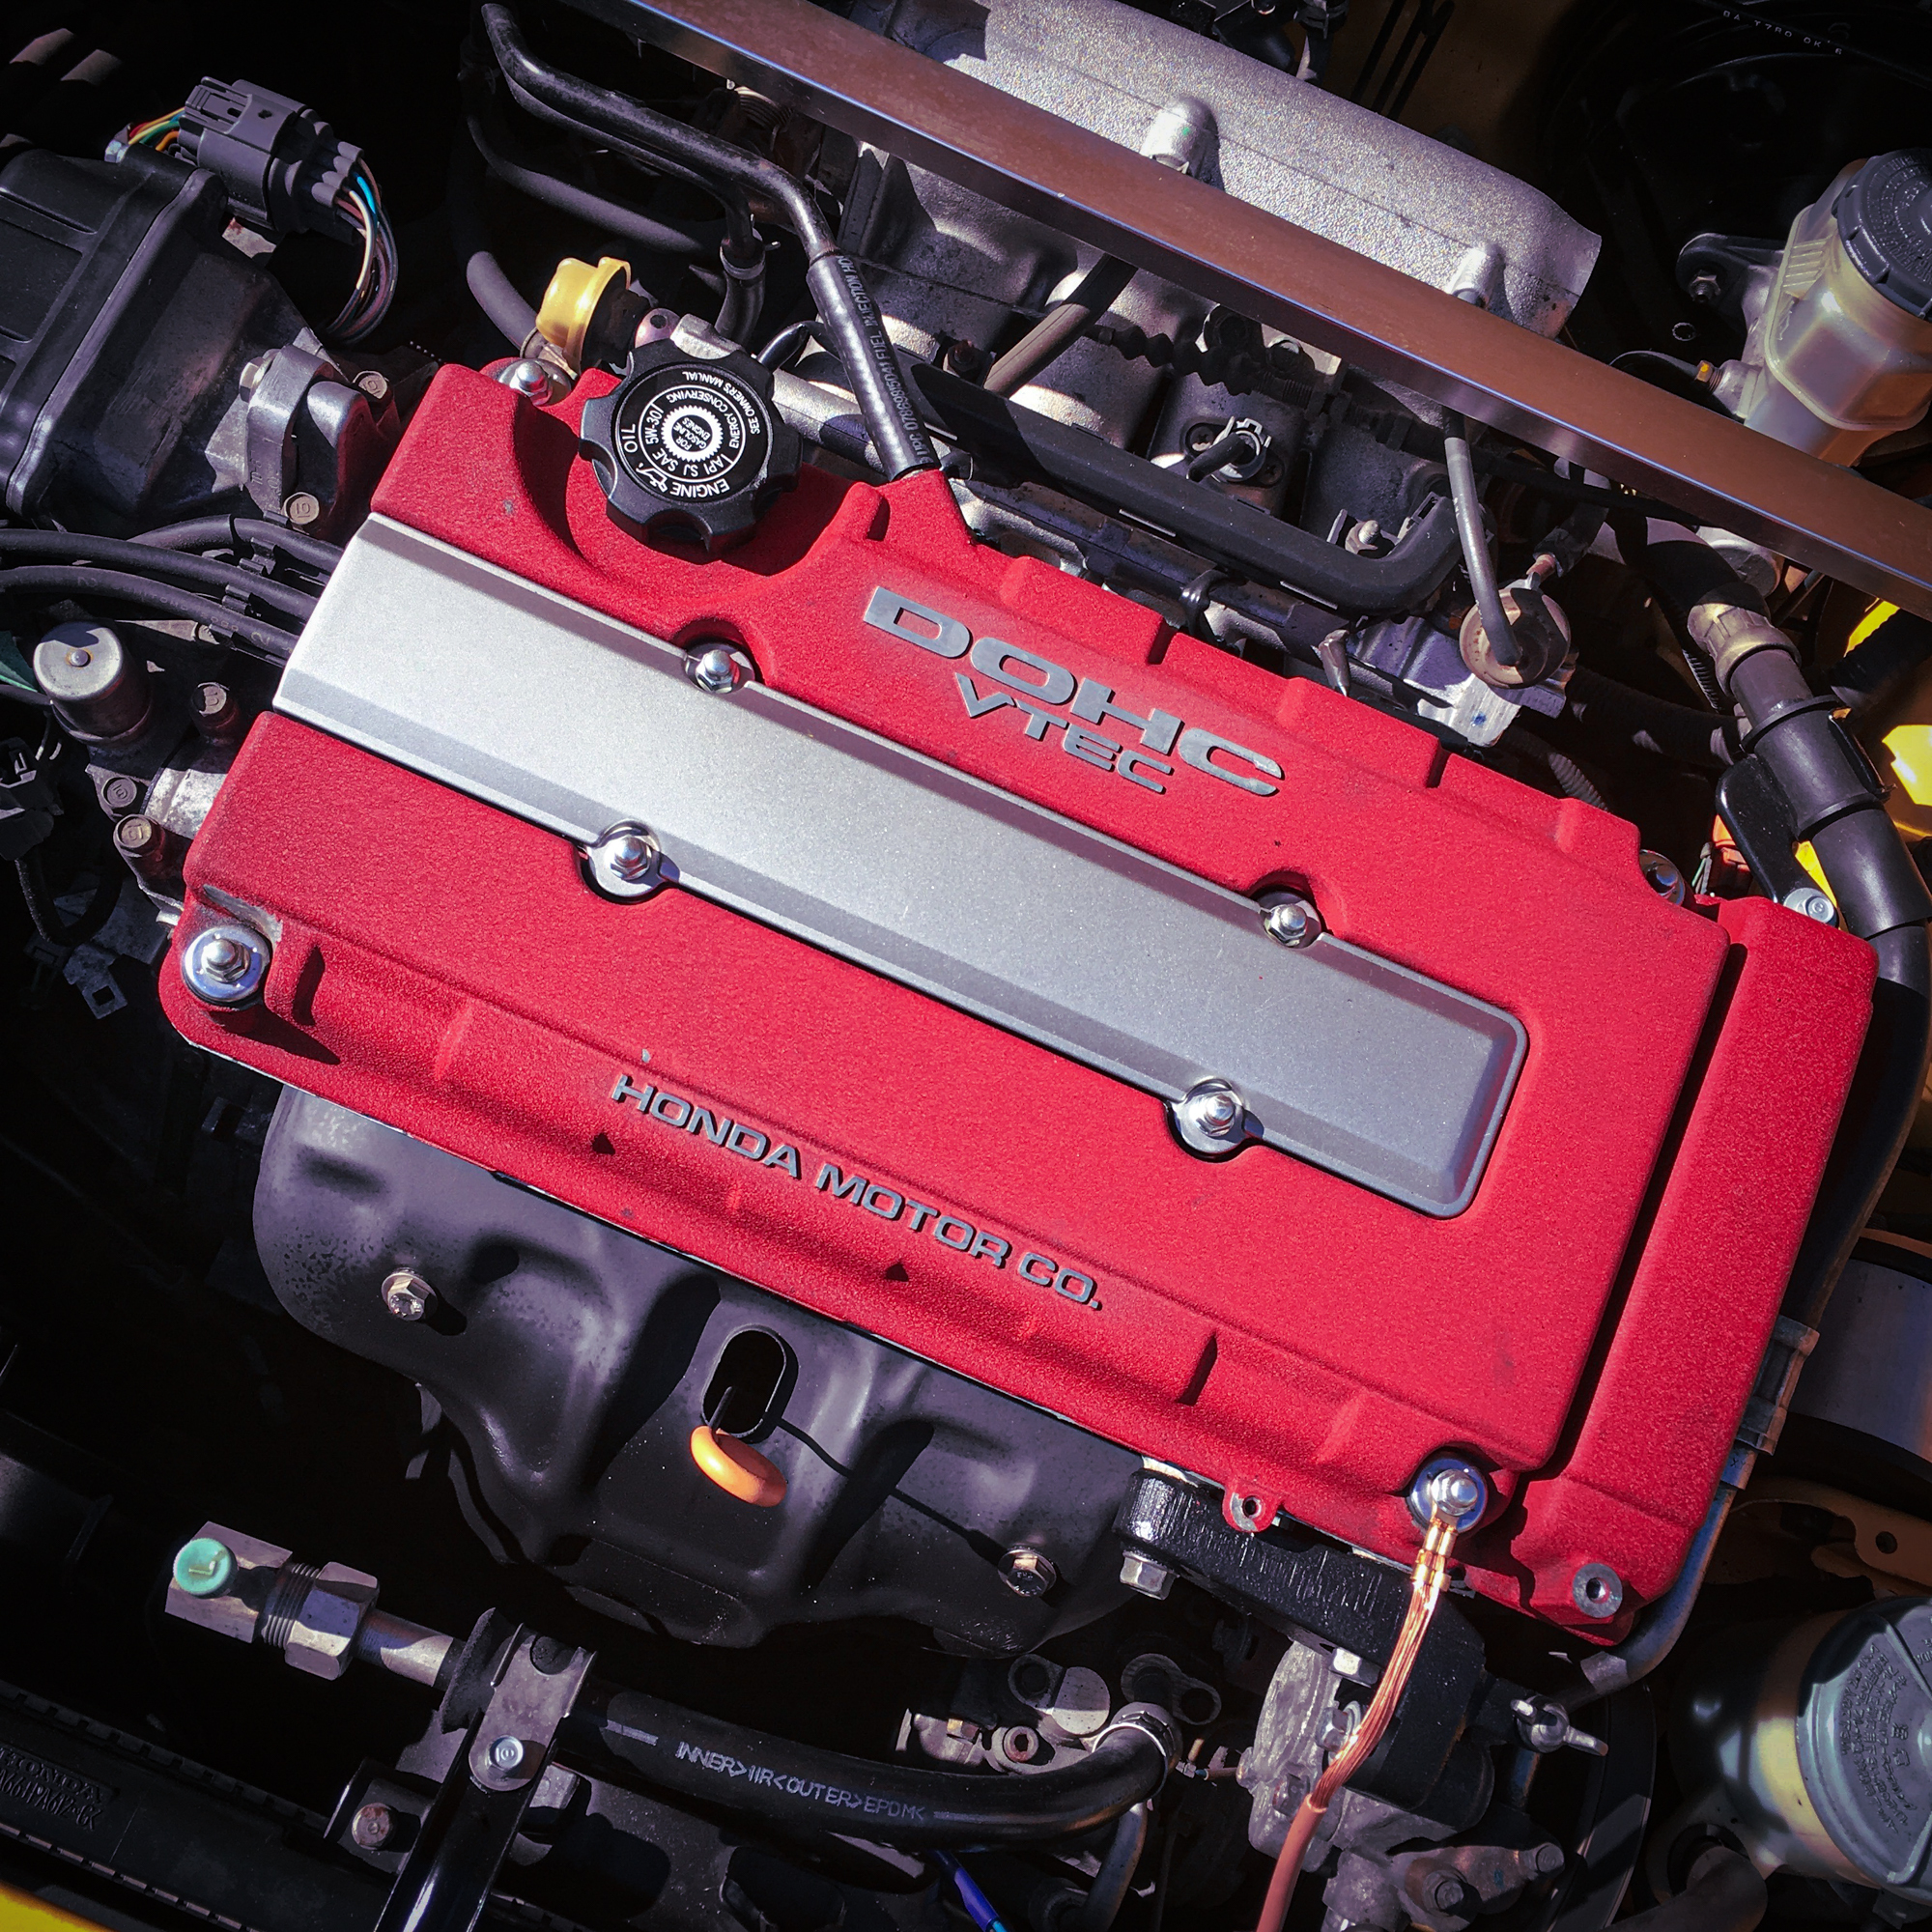 Acura Integra Type R dohc vtec engine